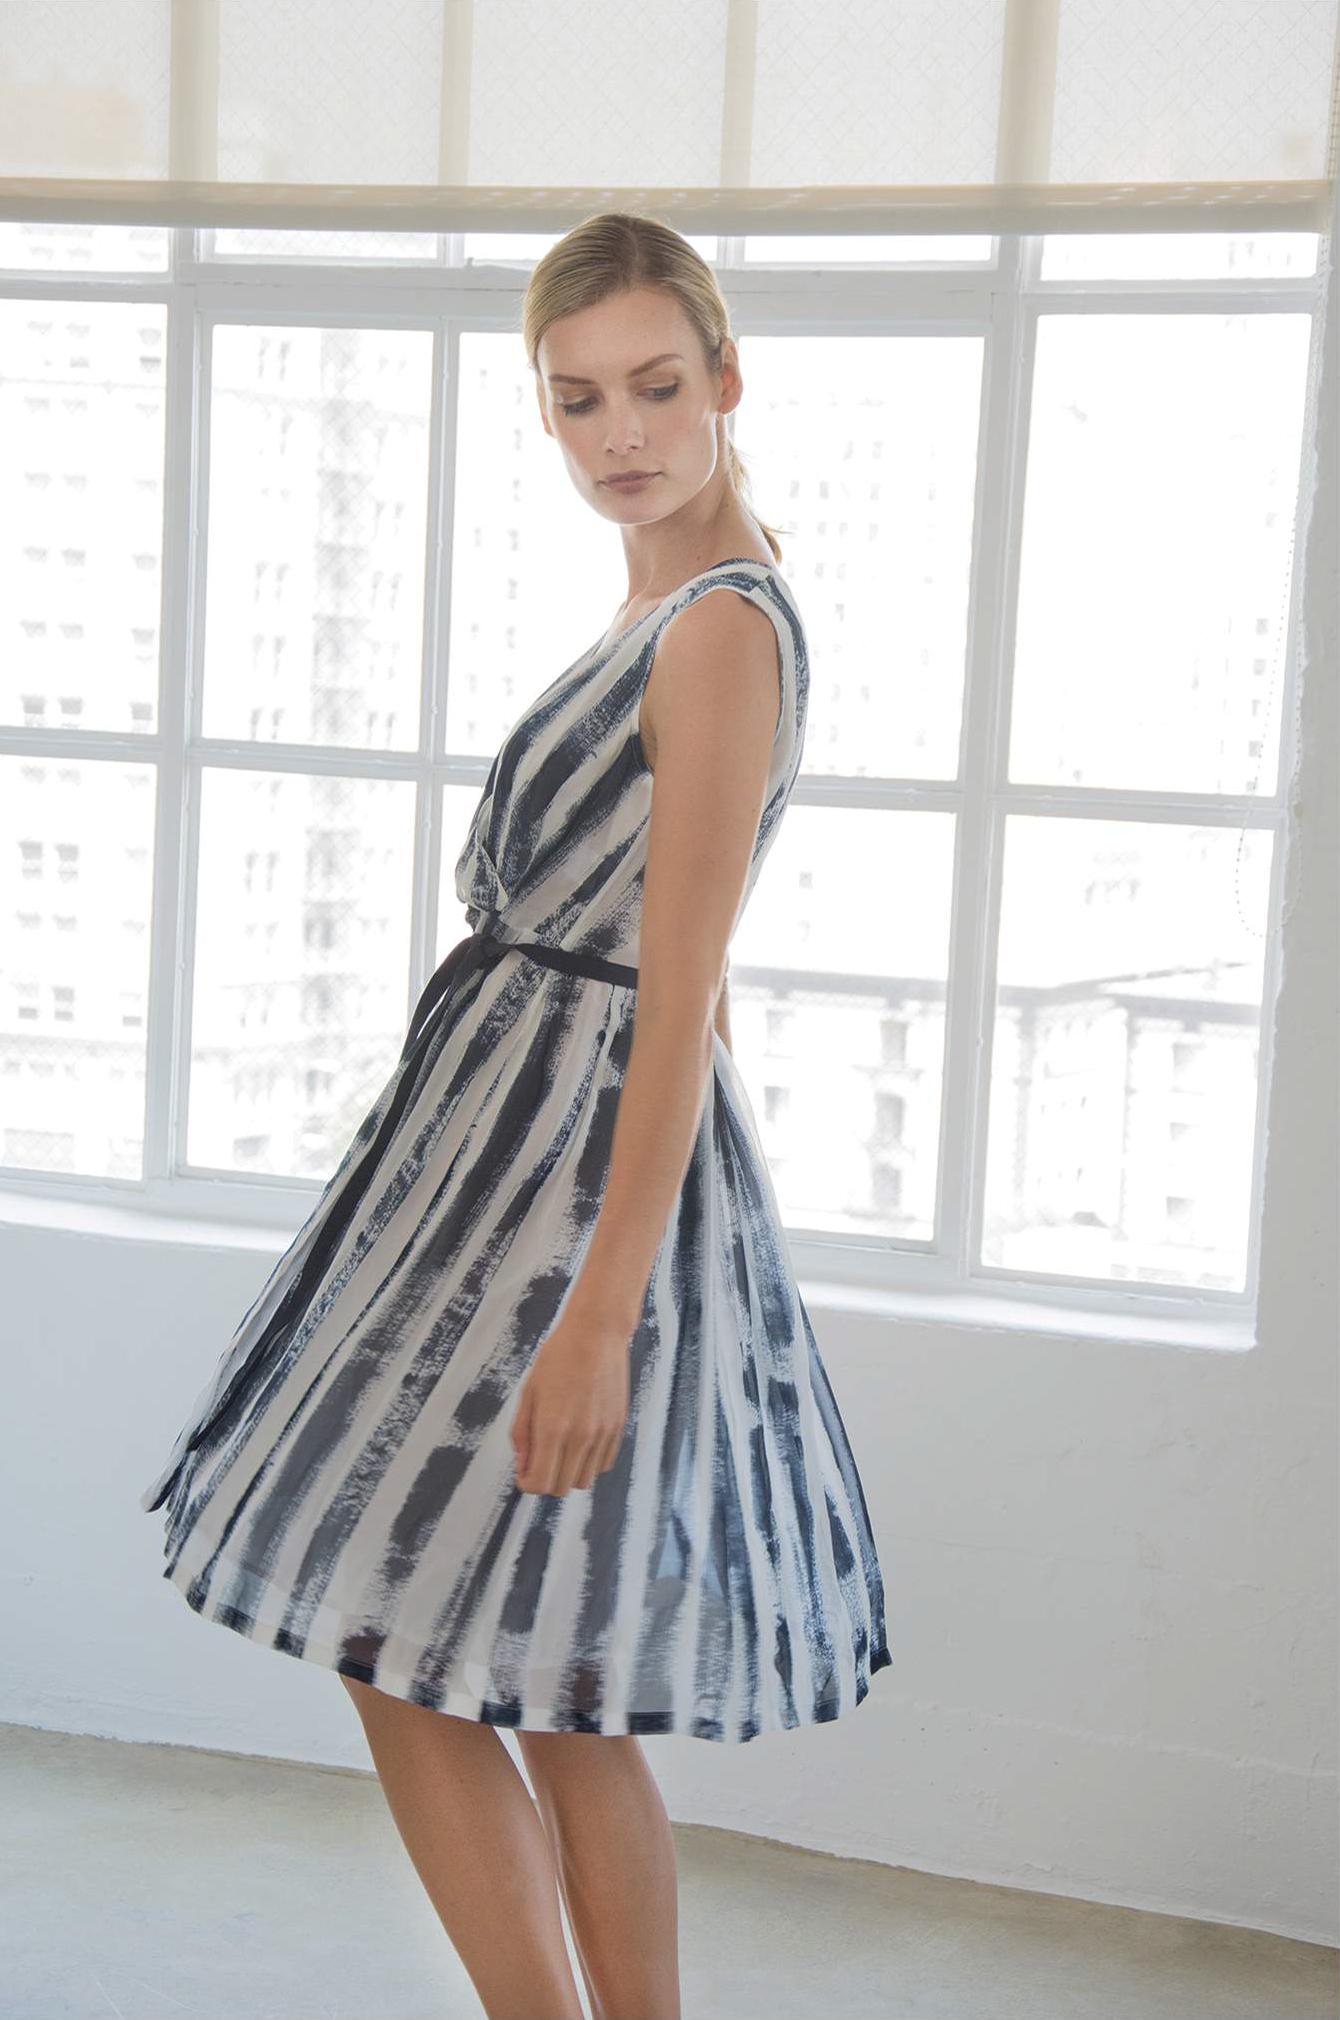 Dress: Fergie - SANTORELLI